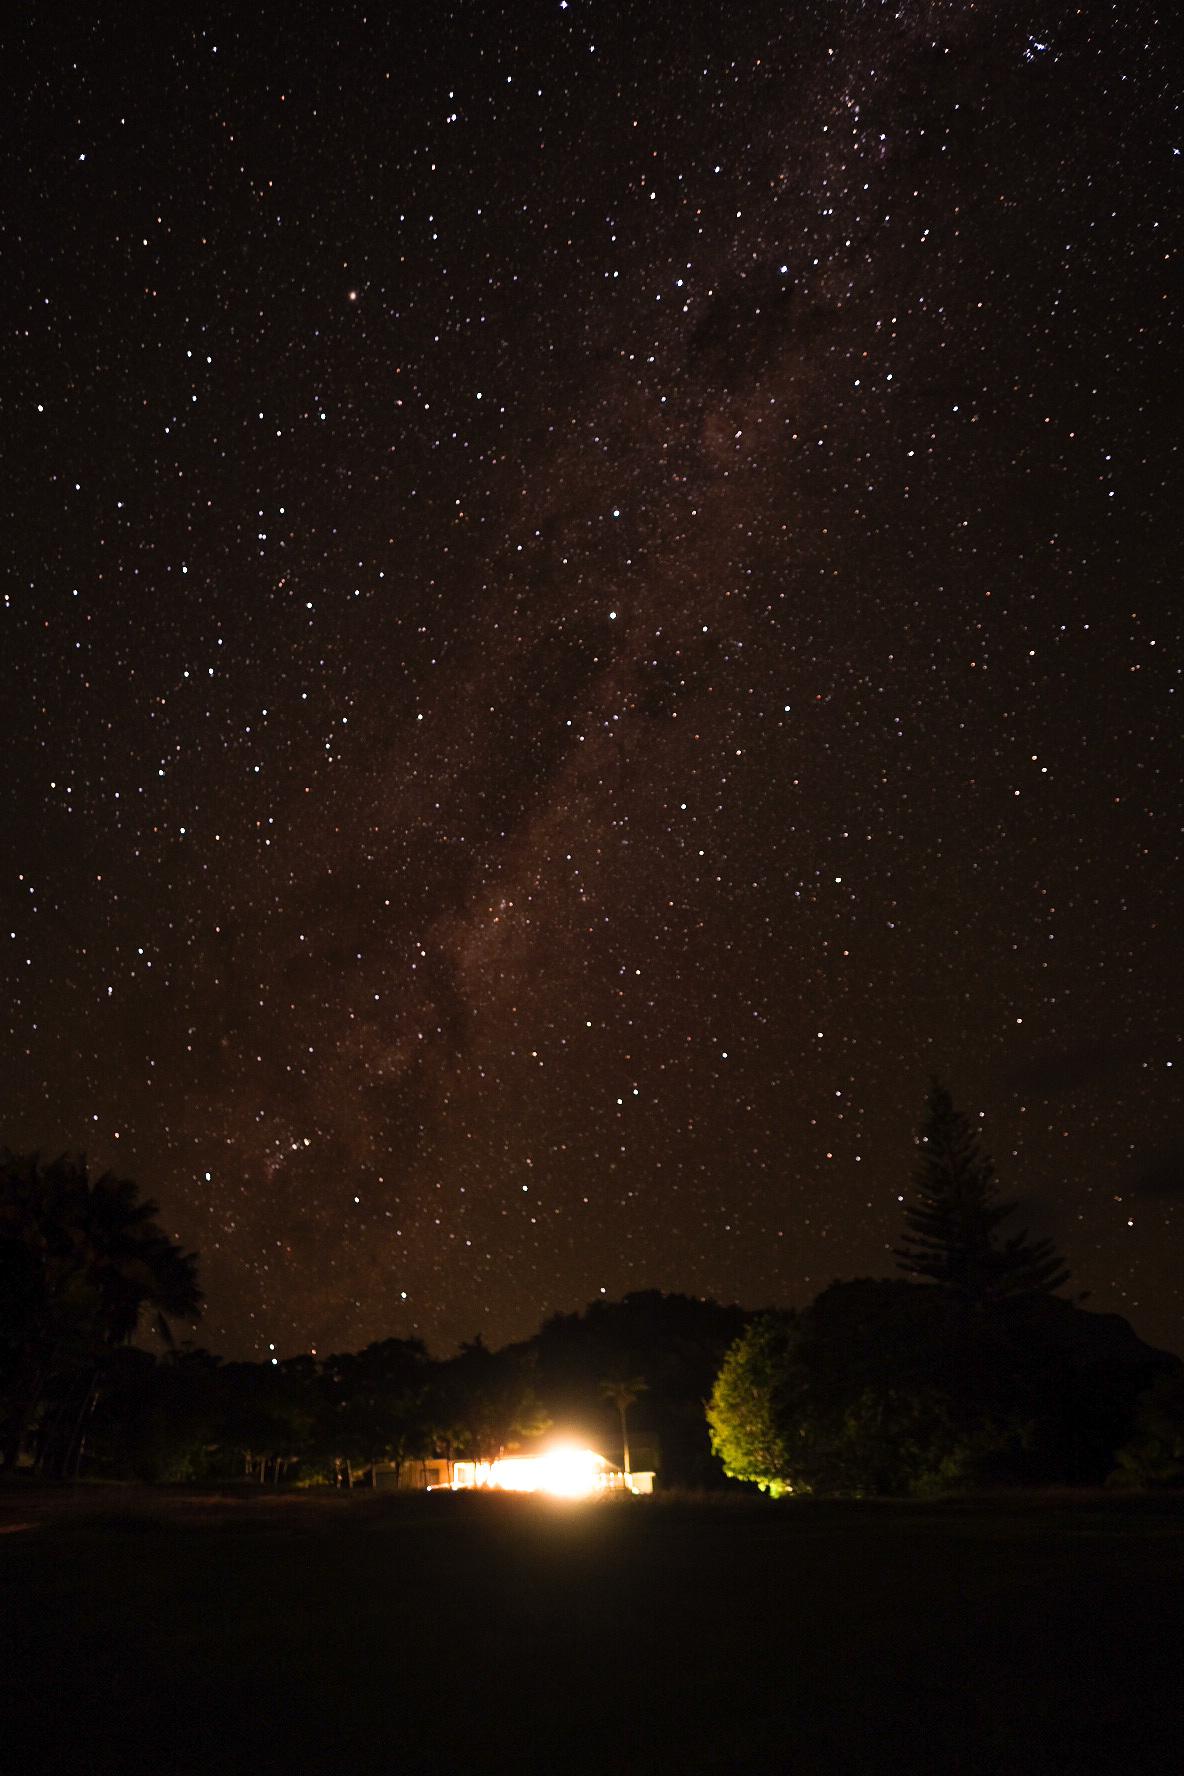 Milky Way stars above home